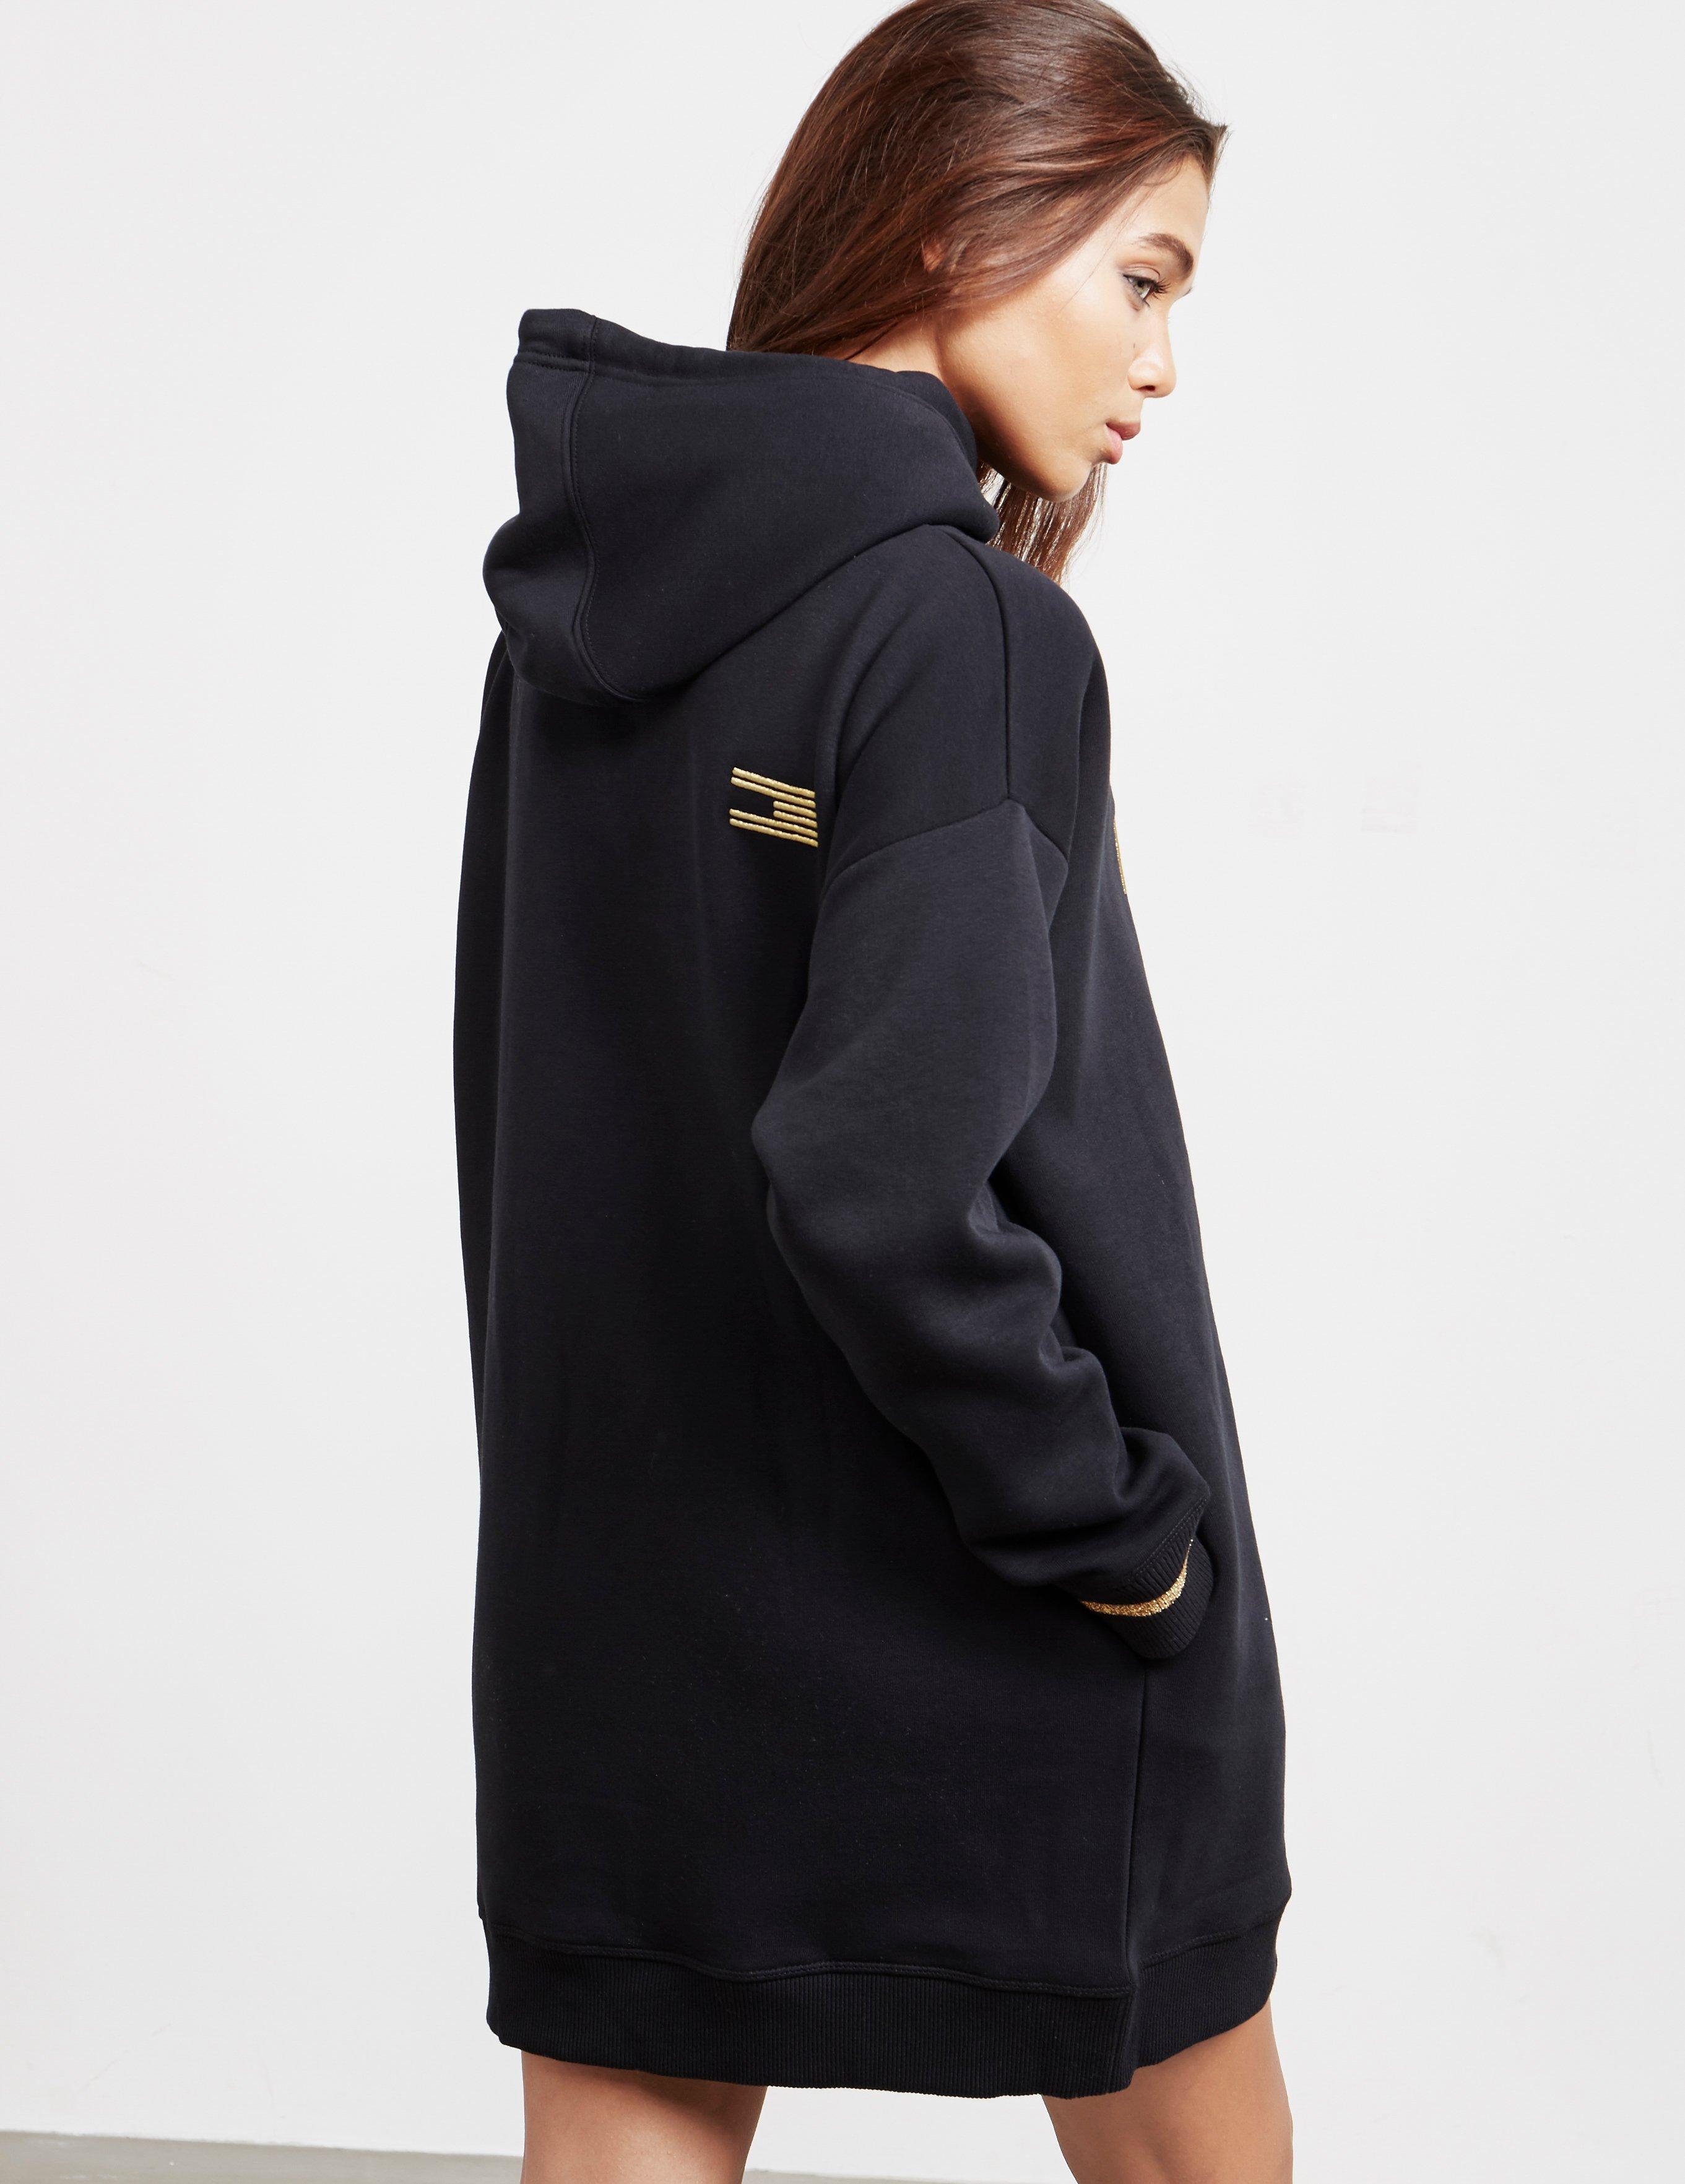 0d670ef5579 Tommy Hilfiger Womens Noelle Hooded Dress Black in Black - Lyst